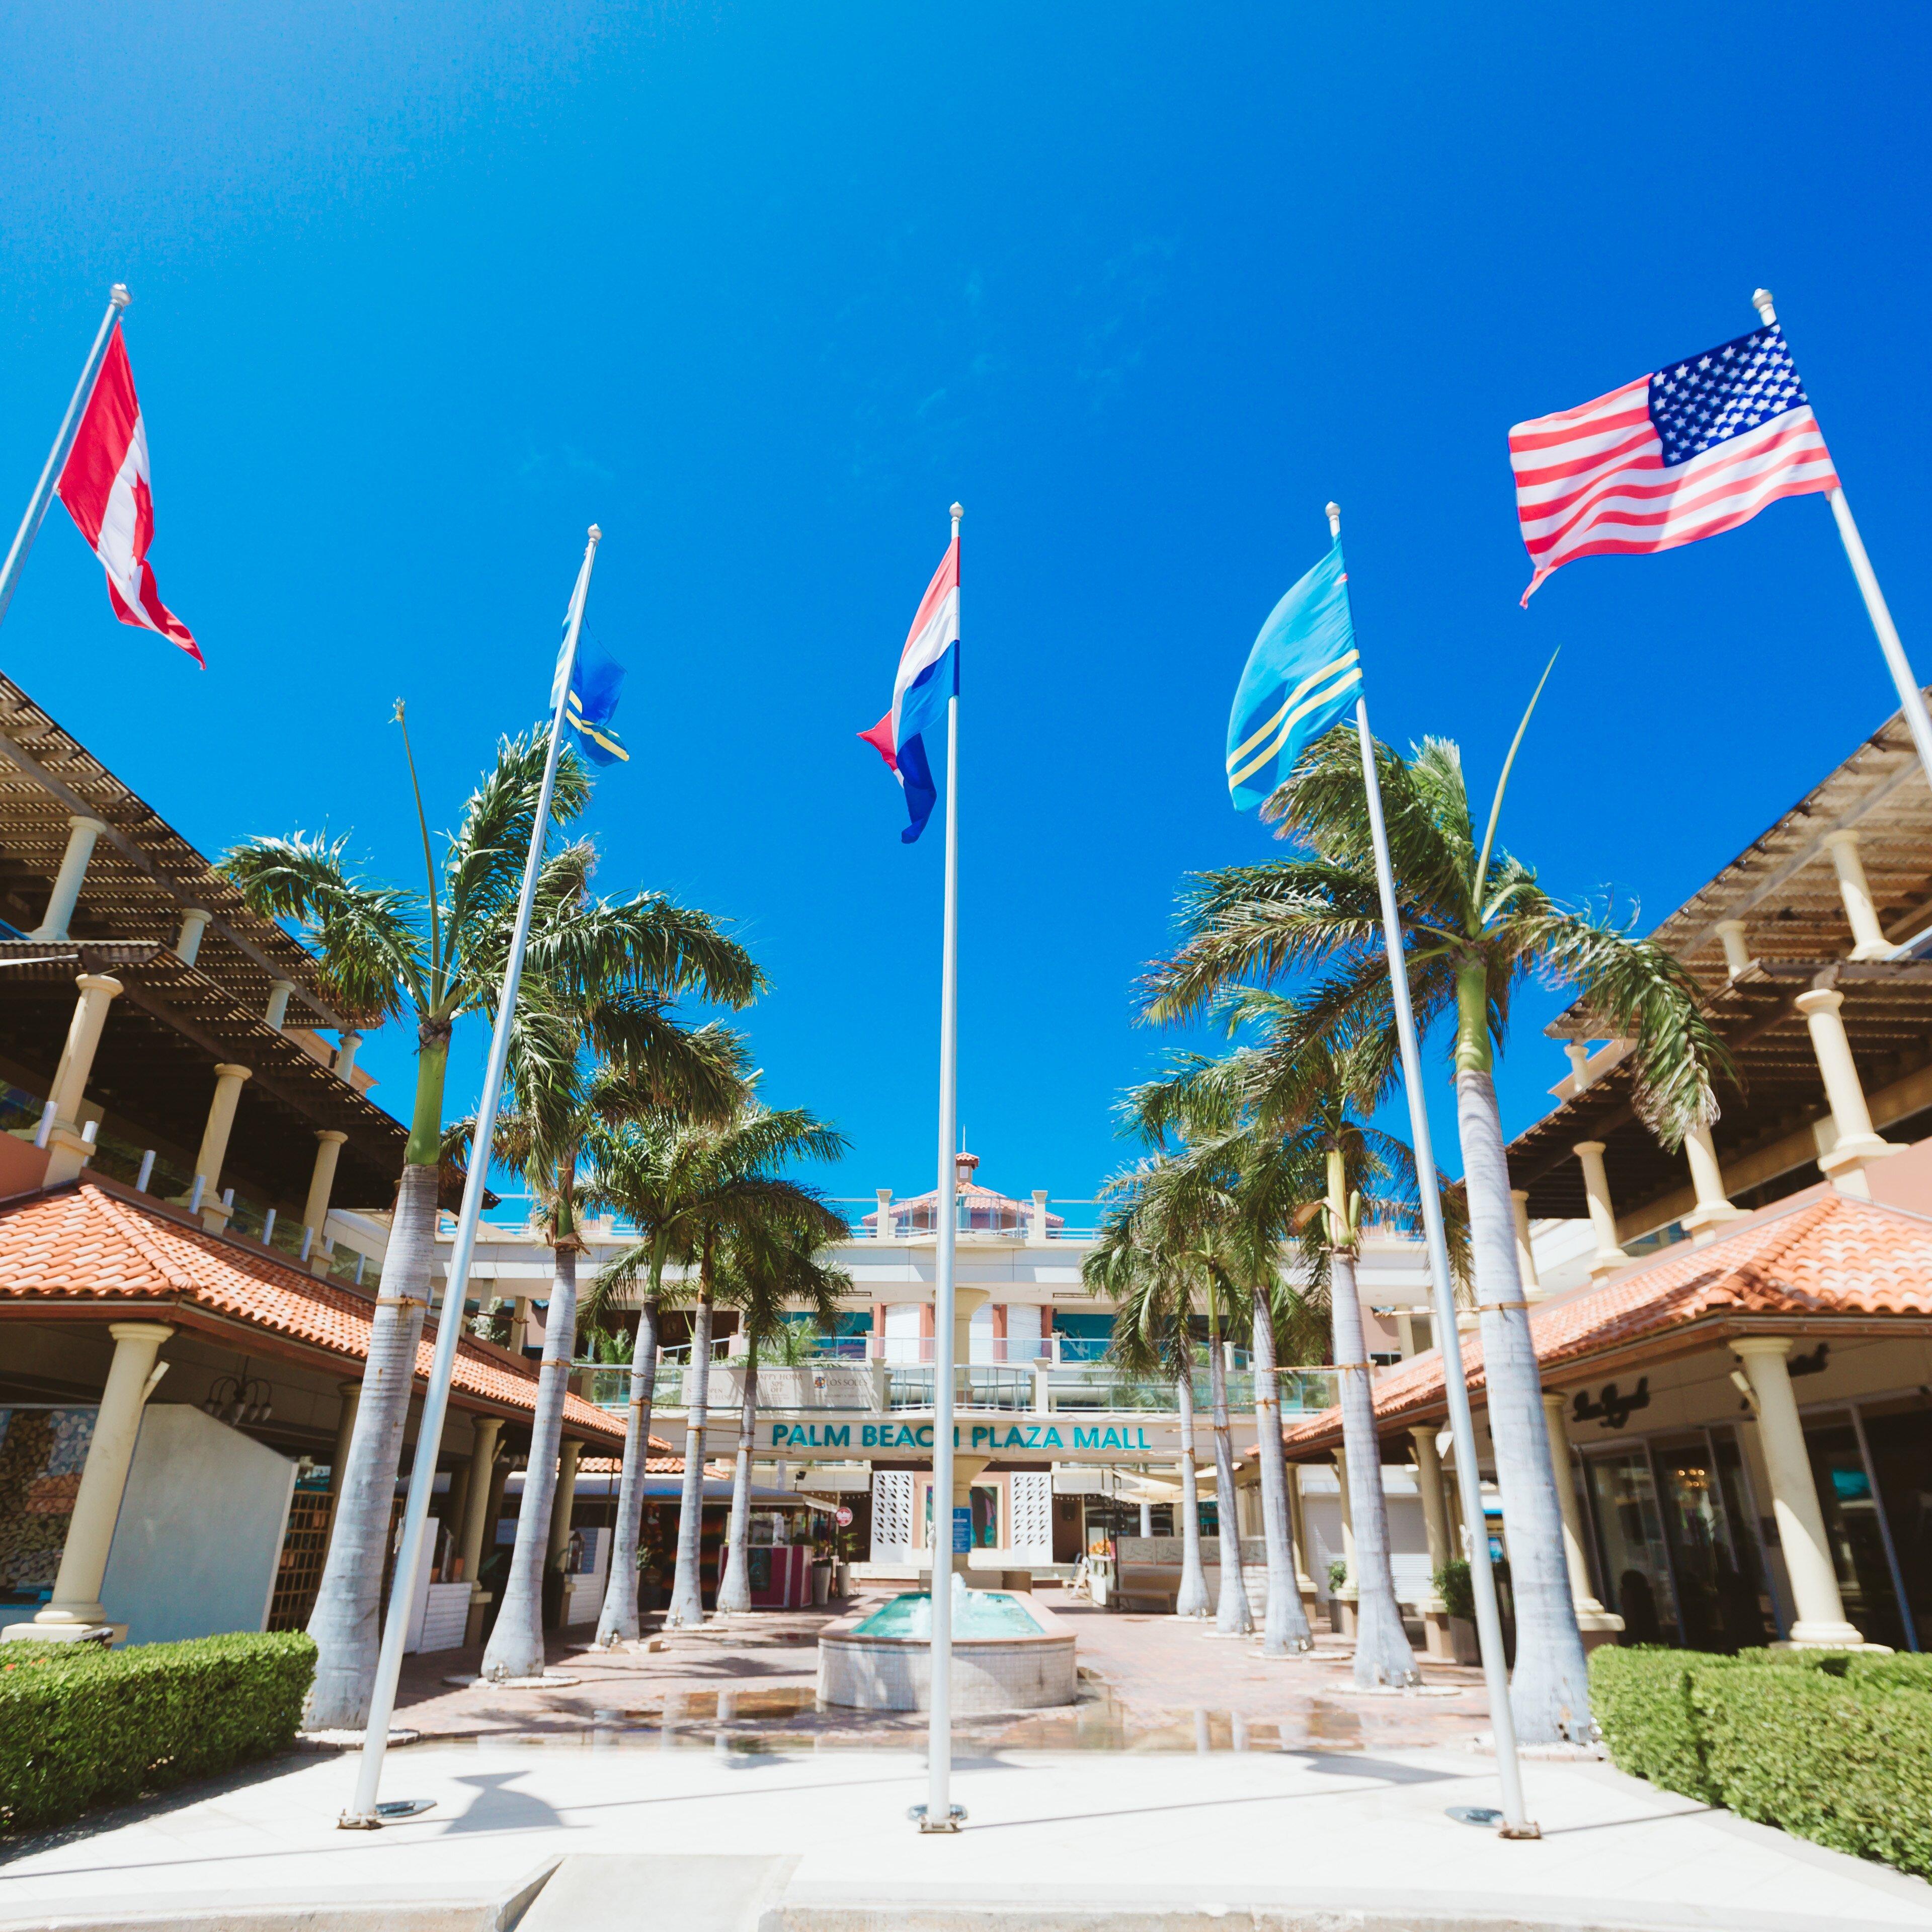 Home Dutch Square Center >> Shopping Malls In Palm Beach Aruba The Palm Beach Plaza Mall